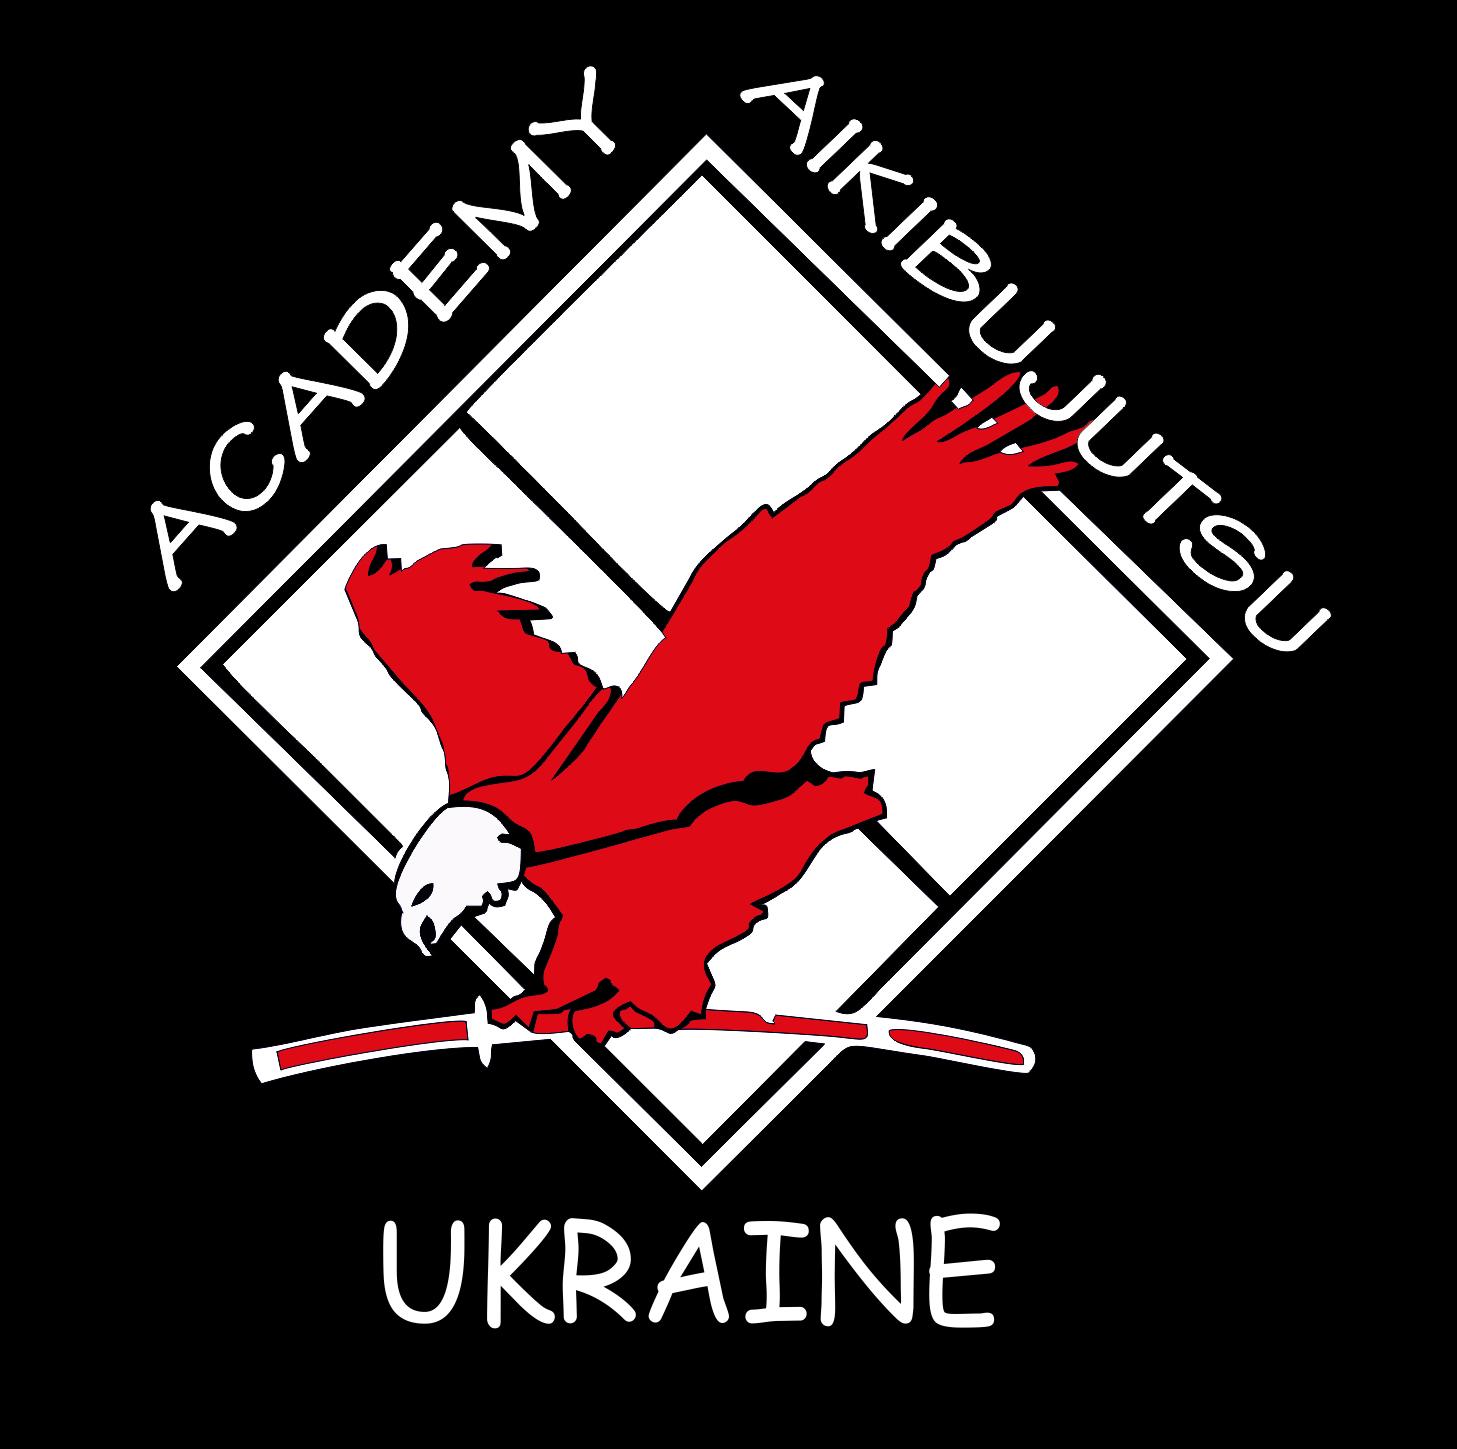 Academy Aikibujutsu - Таййо Додзьо|Спорт